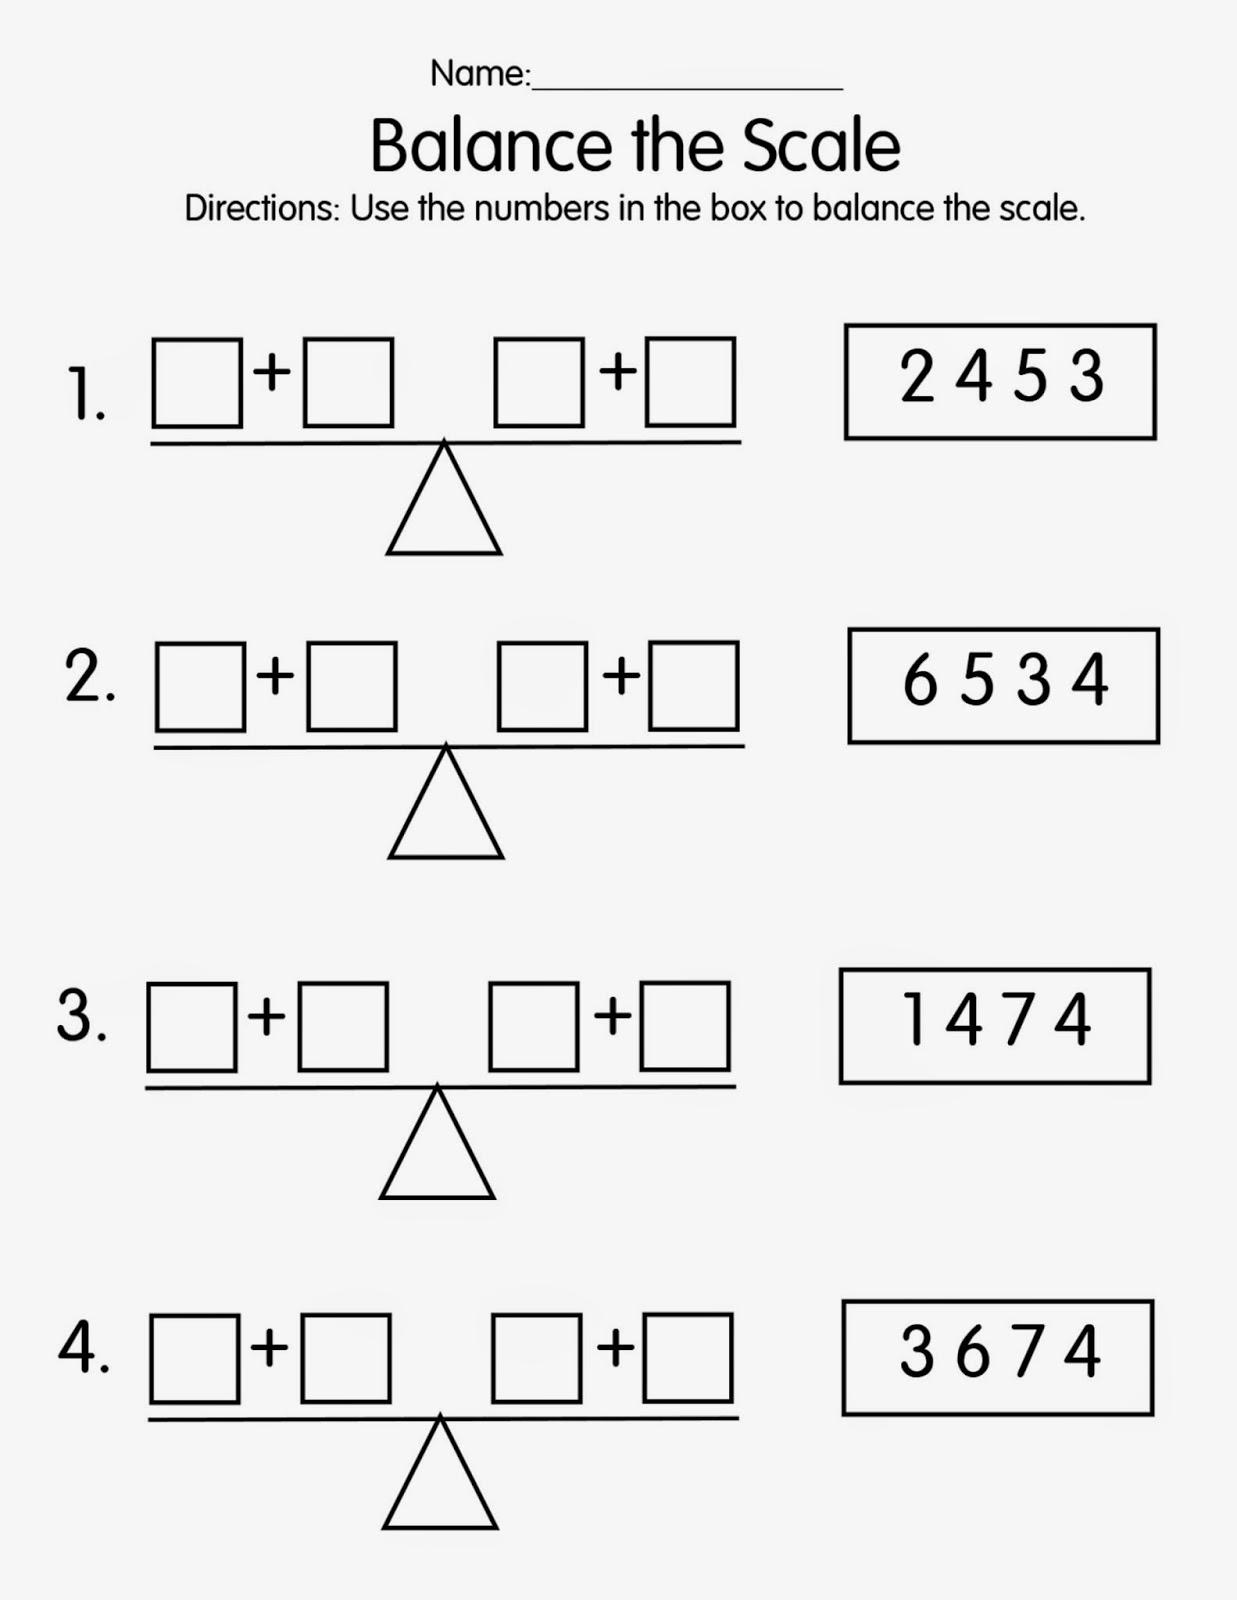 Mrs Ts First Grade Class Balance the Scale – Balanced Equations Worksheet